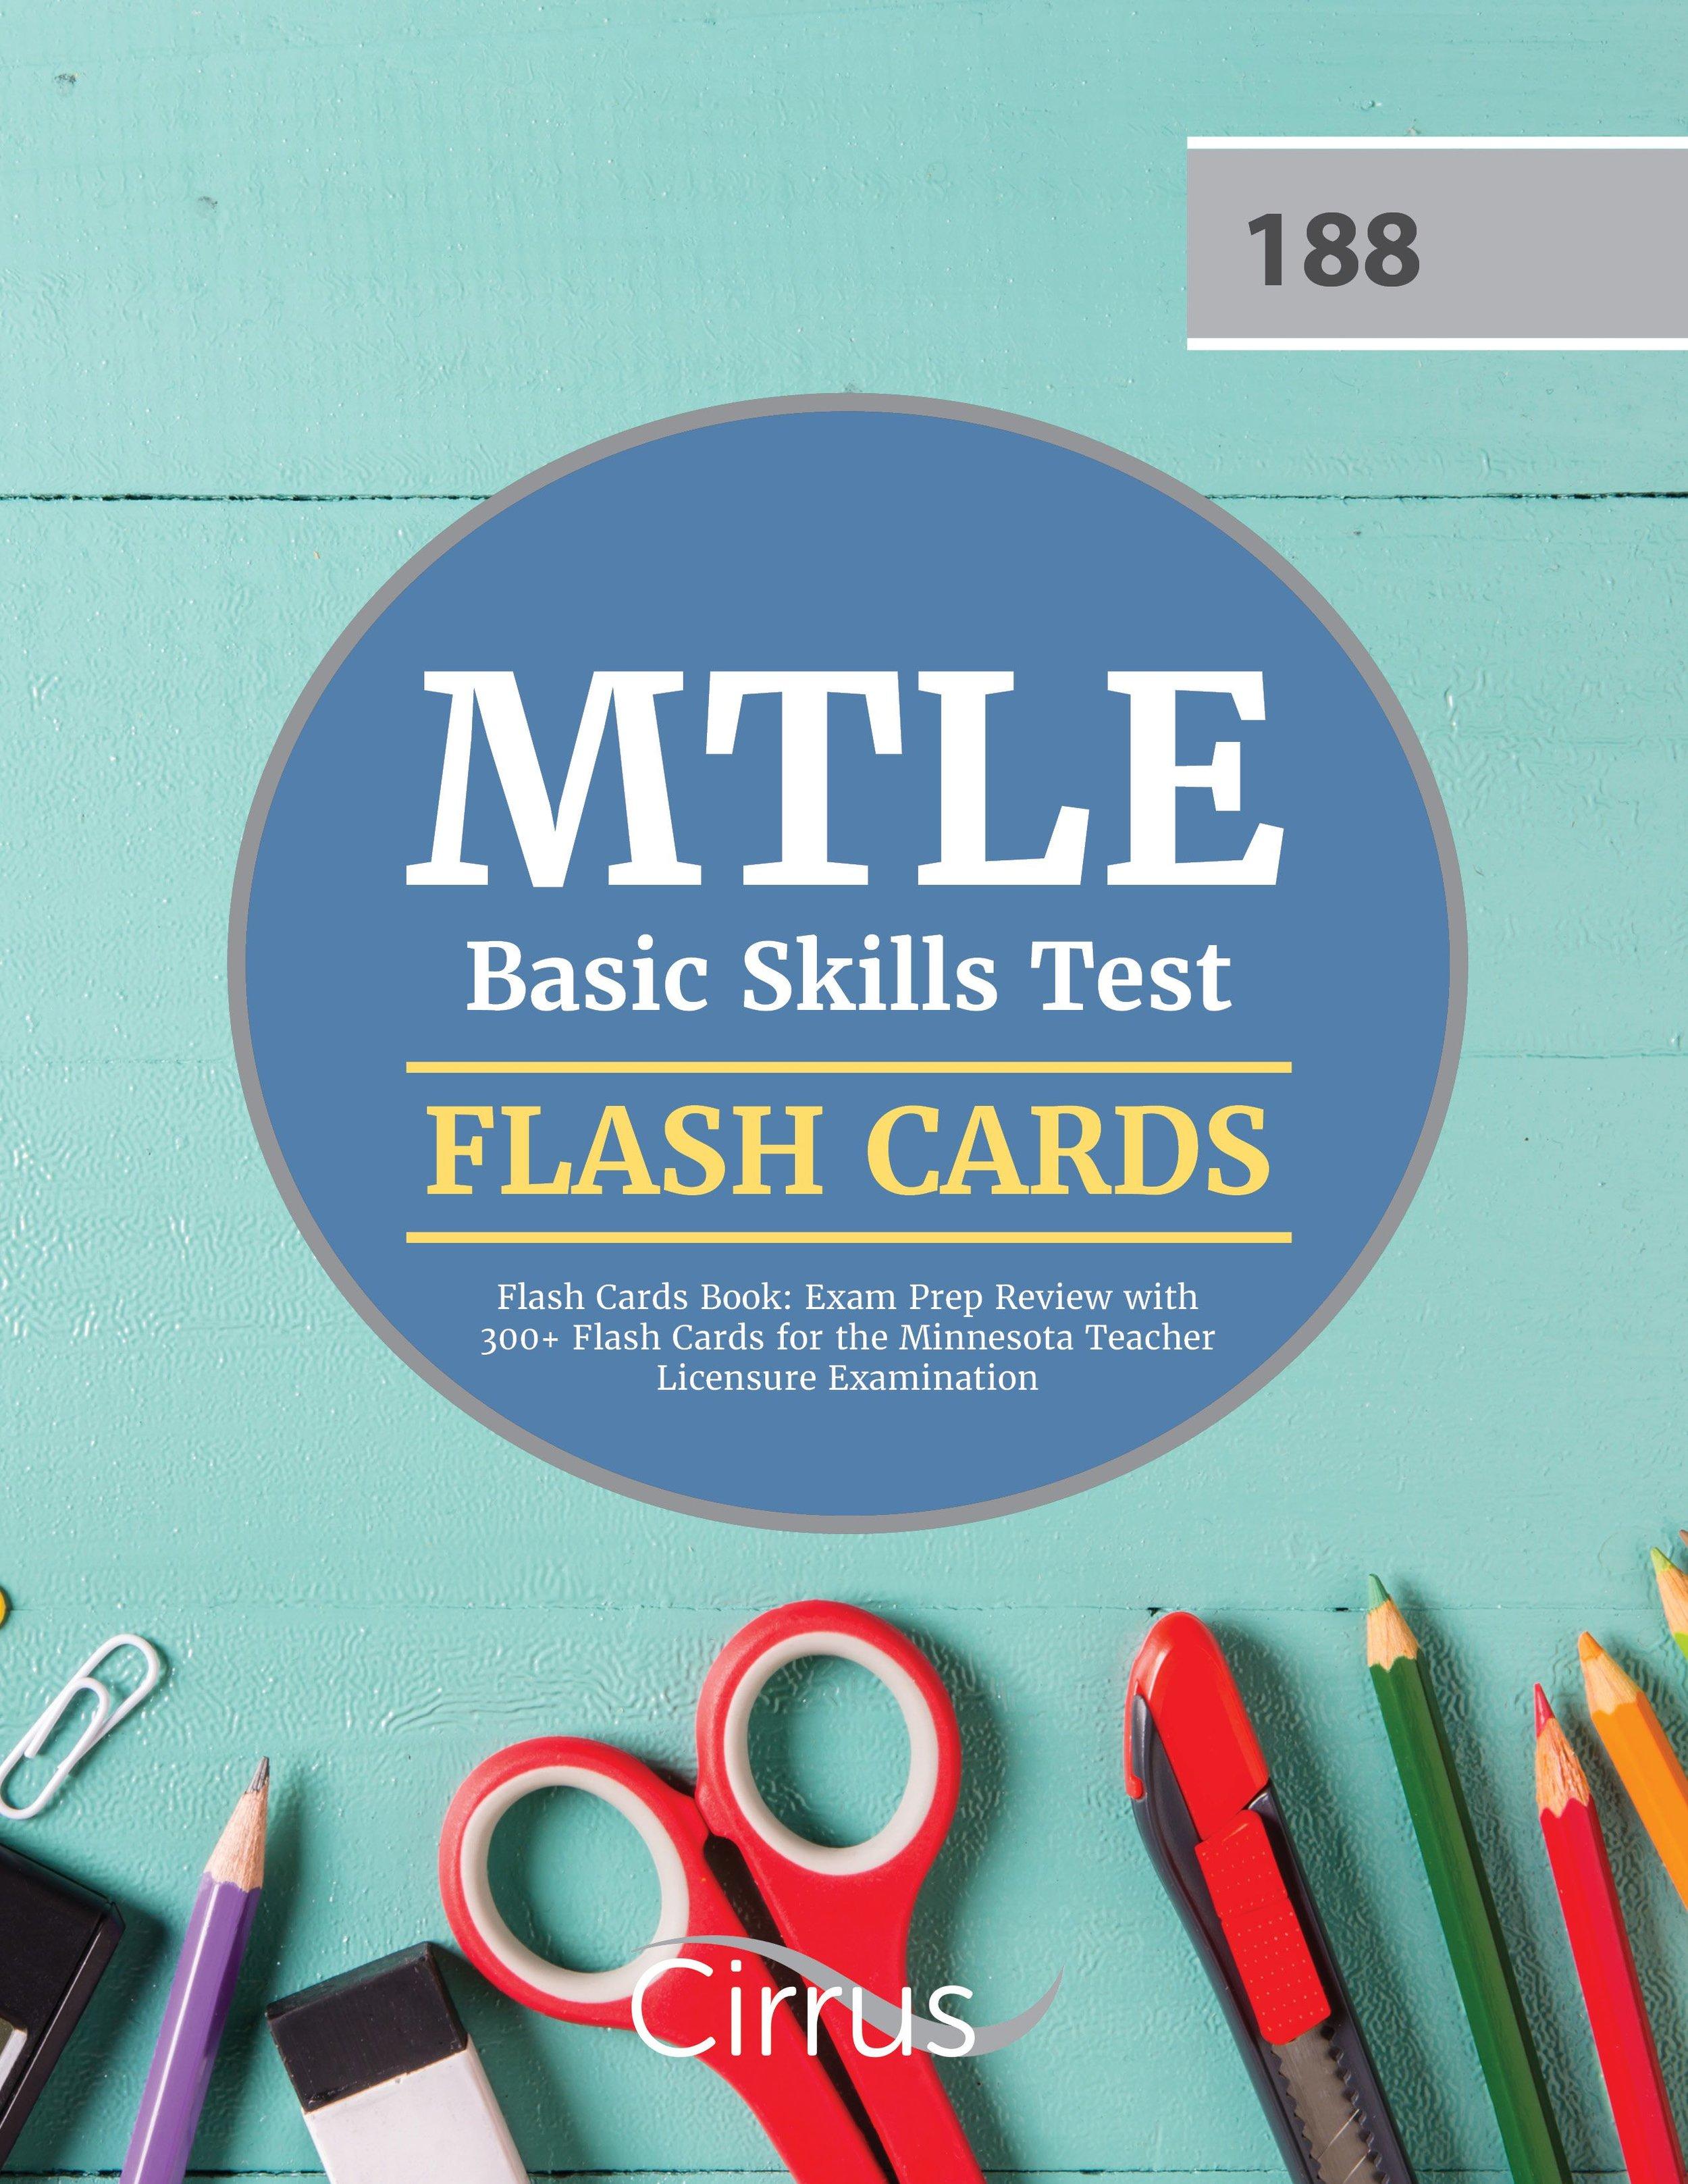 MTLE Basic Skills Test Exam Prep Review 188